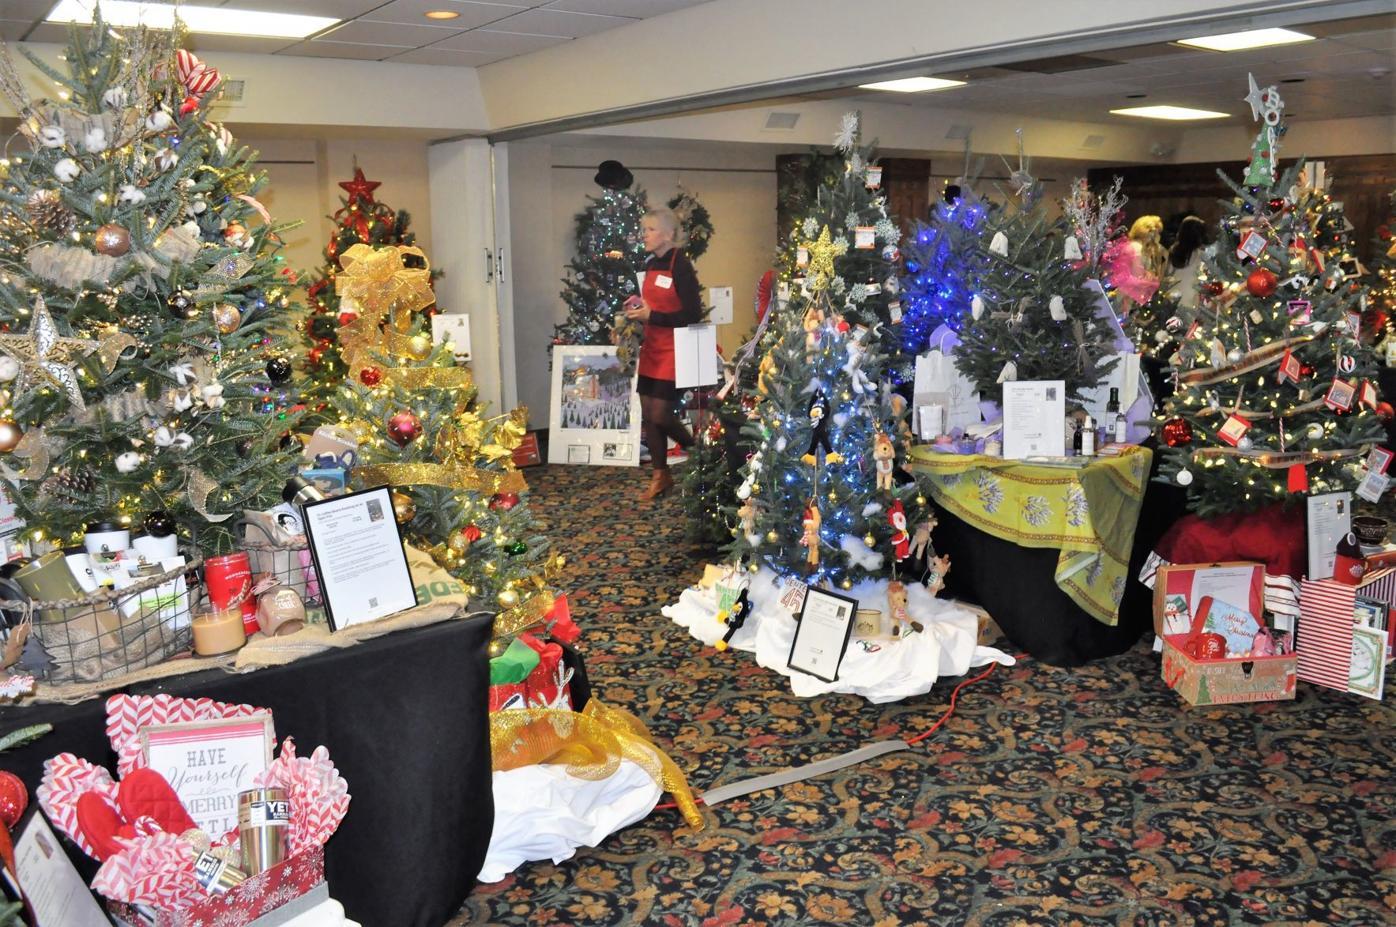 Christmas Trees 2021 Watauga Democrat Festival Of Trees Raises 30 000 For Wyn Mountain Times Wataugademocrat Com